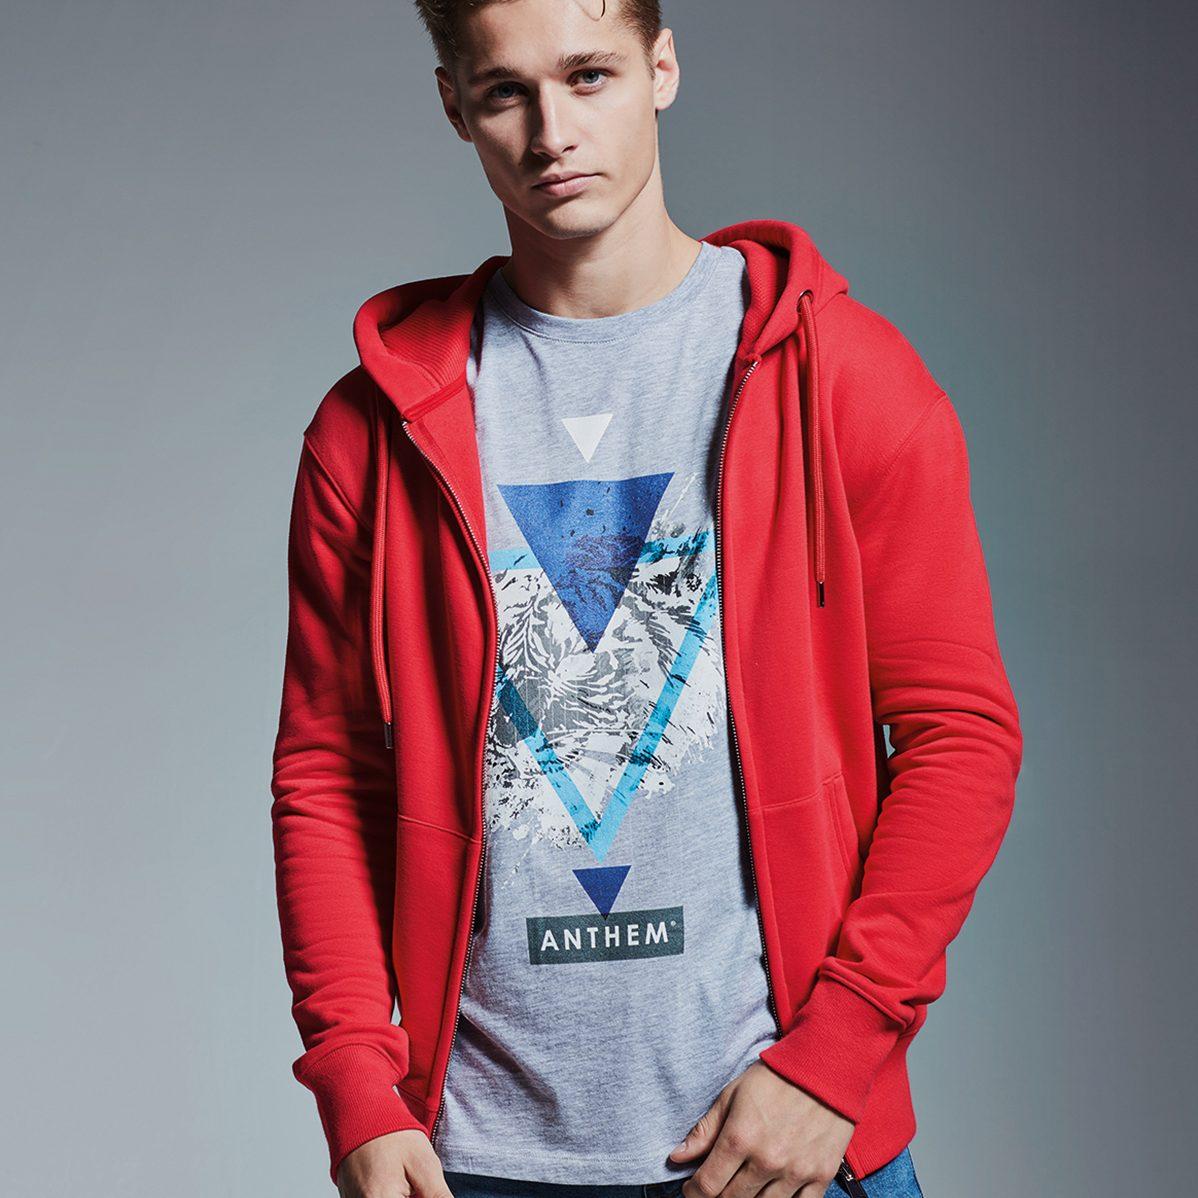 AM002 Anthem men's zip hoodie.